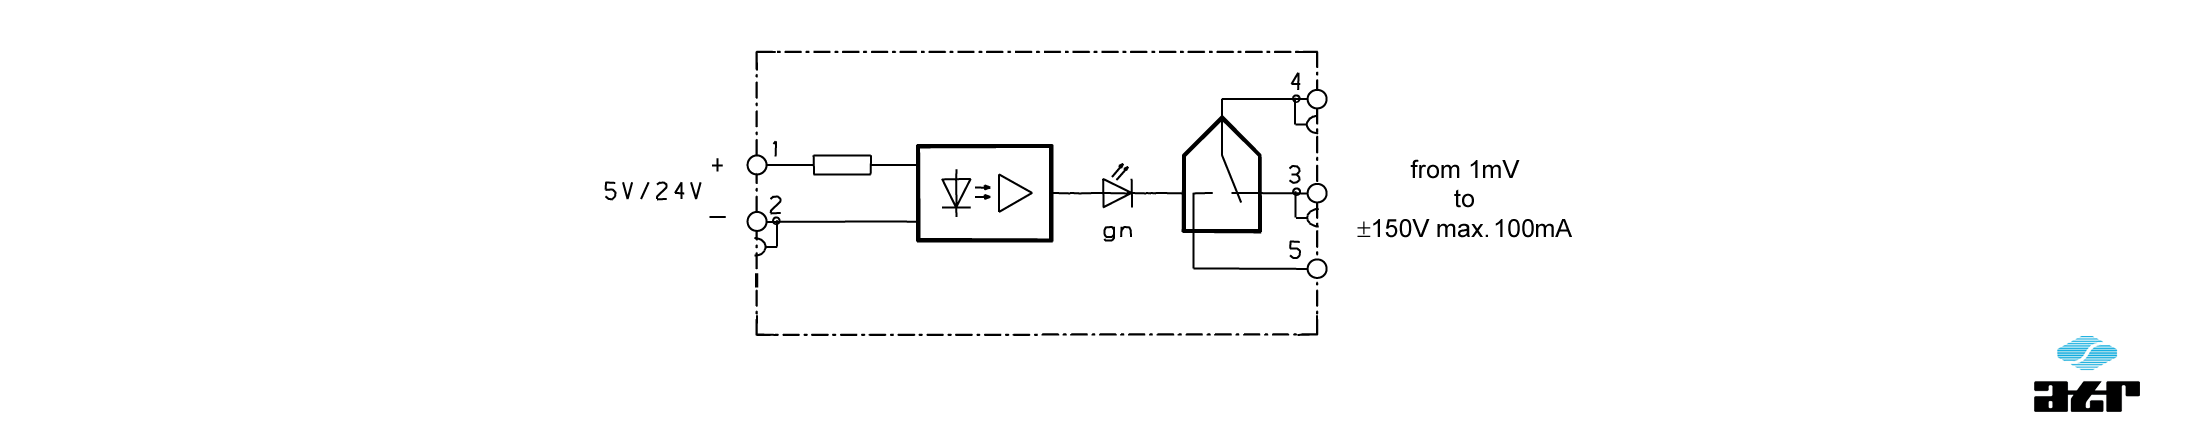 Anschlussplan: ATR Passiver Analogschalter OT10